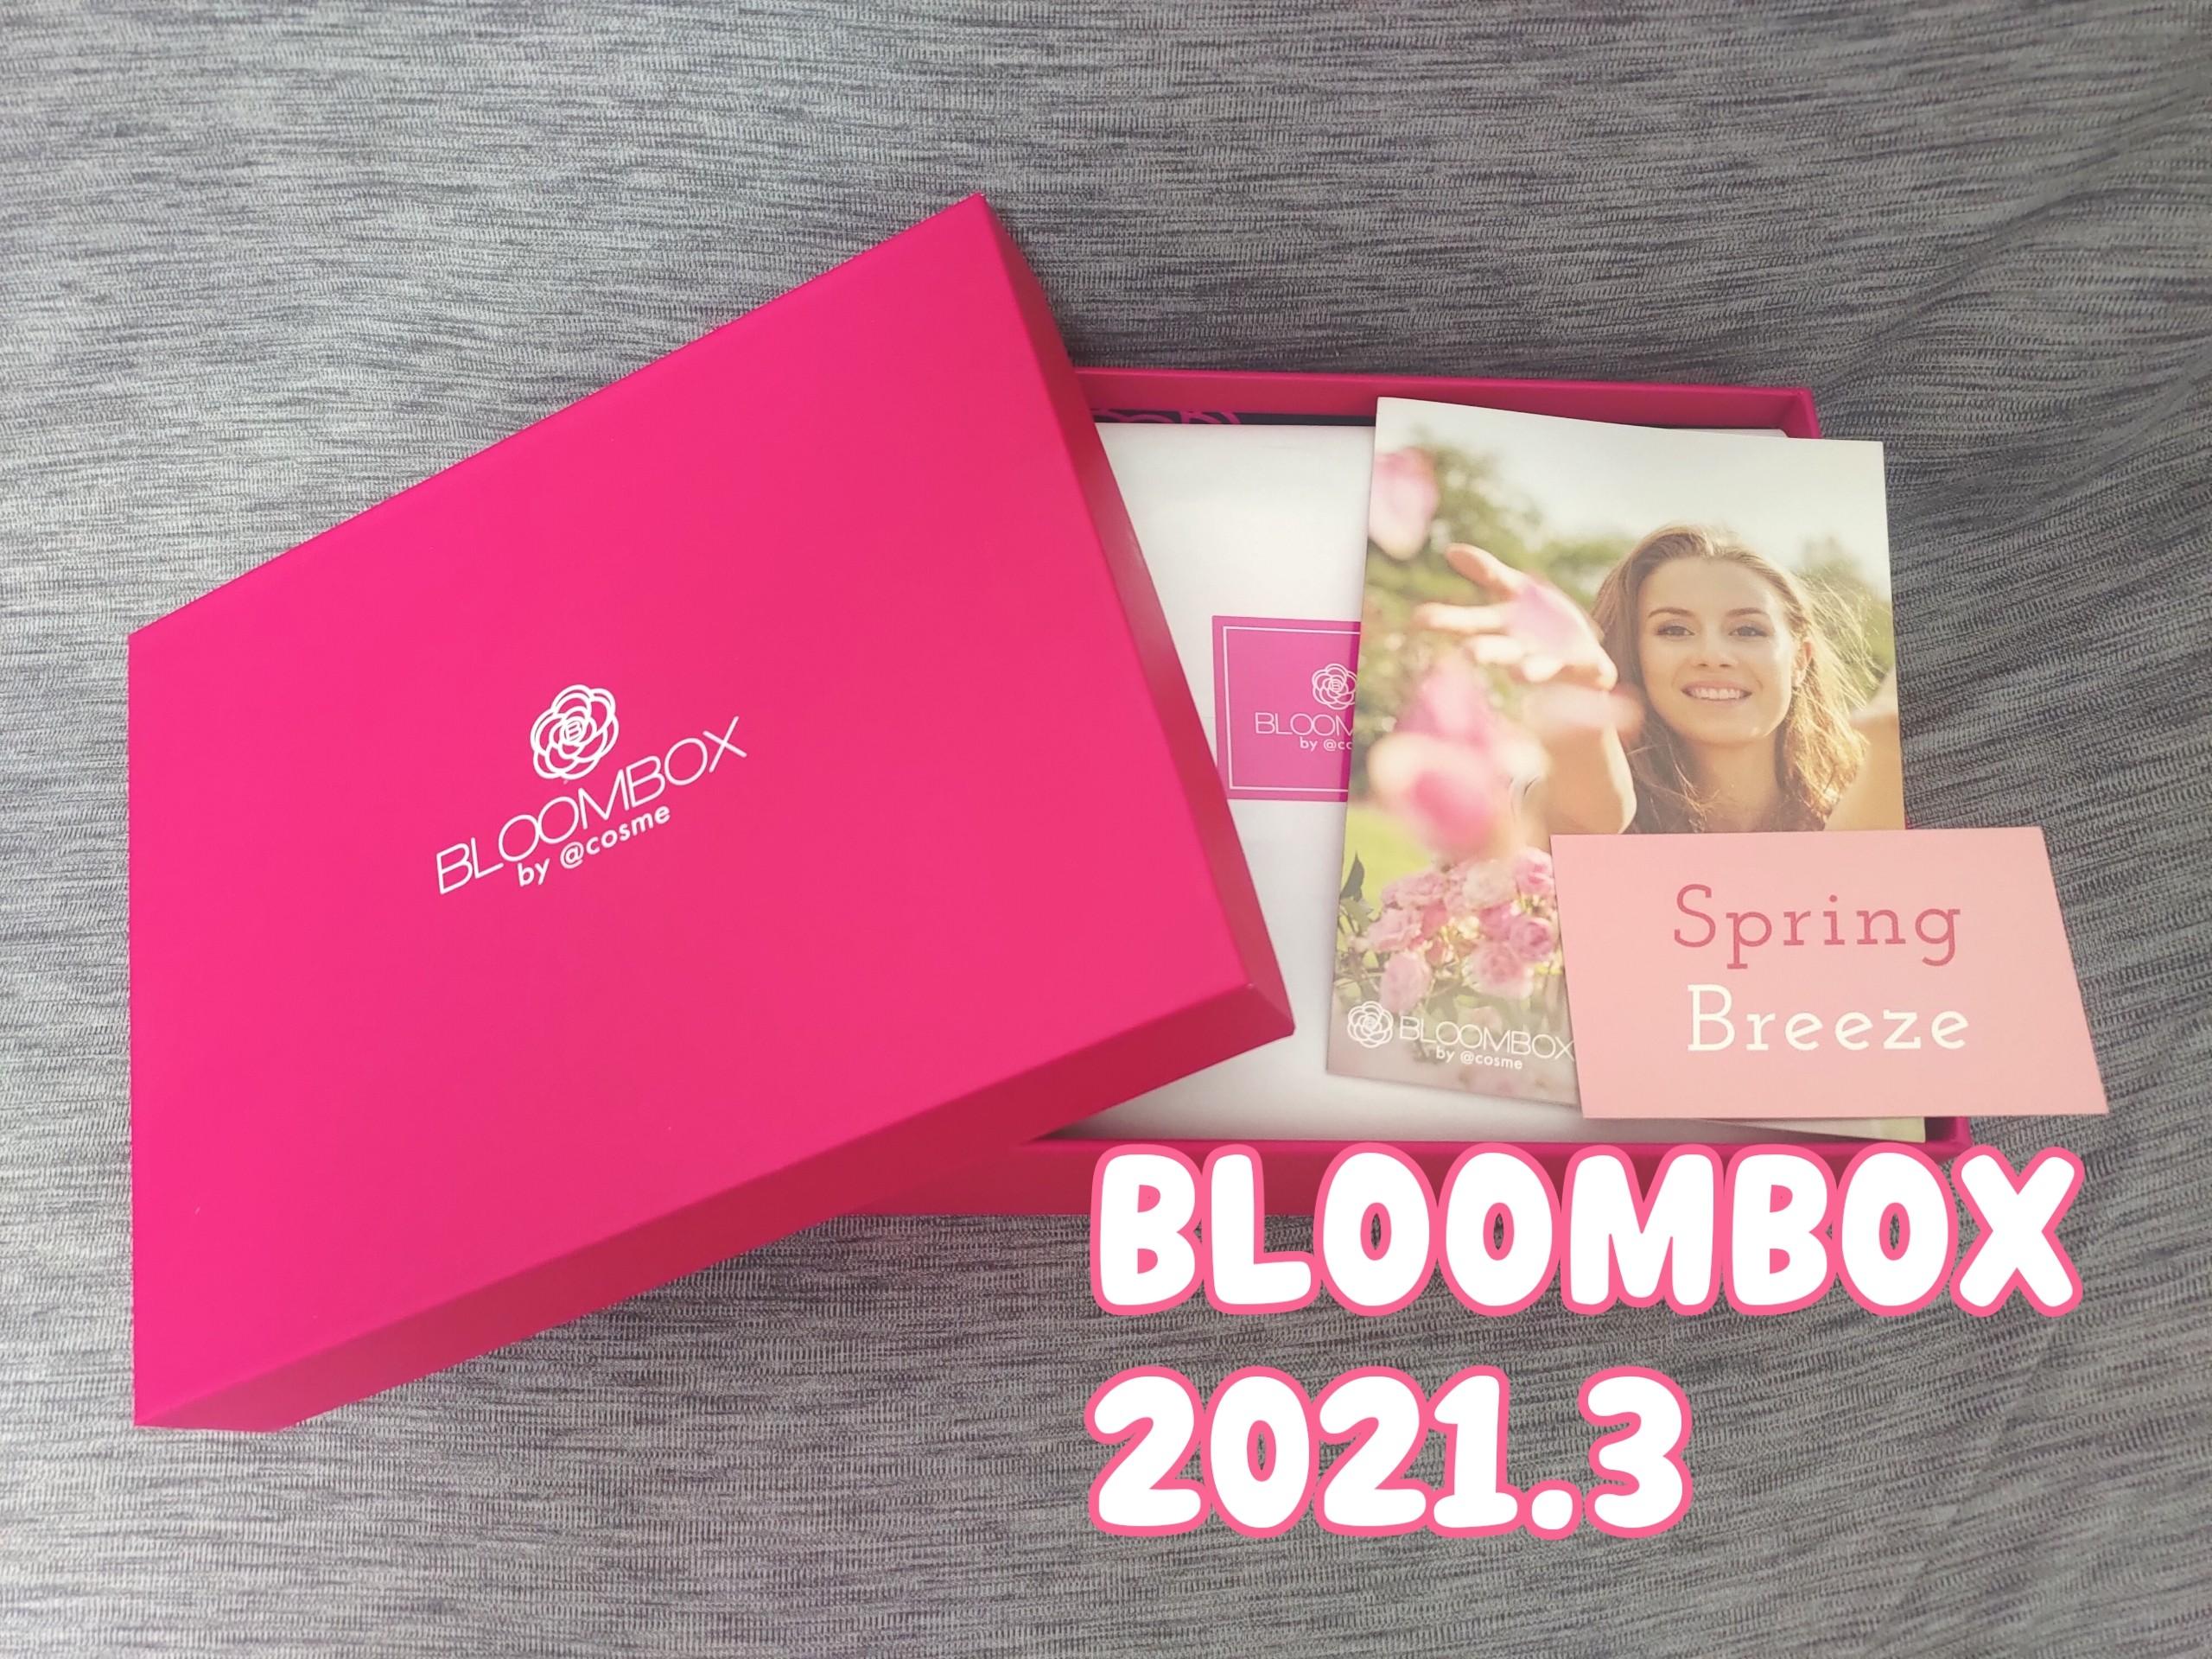 BLOOMBOX 2021年3月 中身公開【ボディケア・ヘアケア多め】